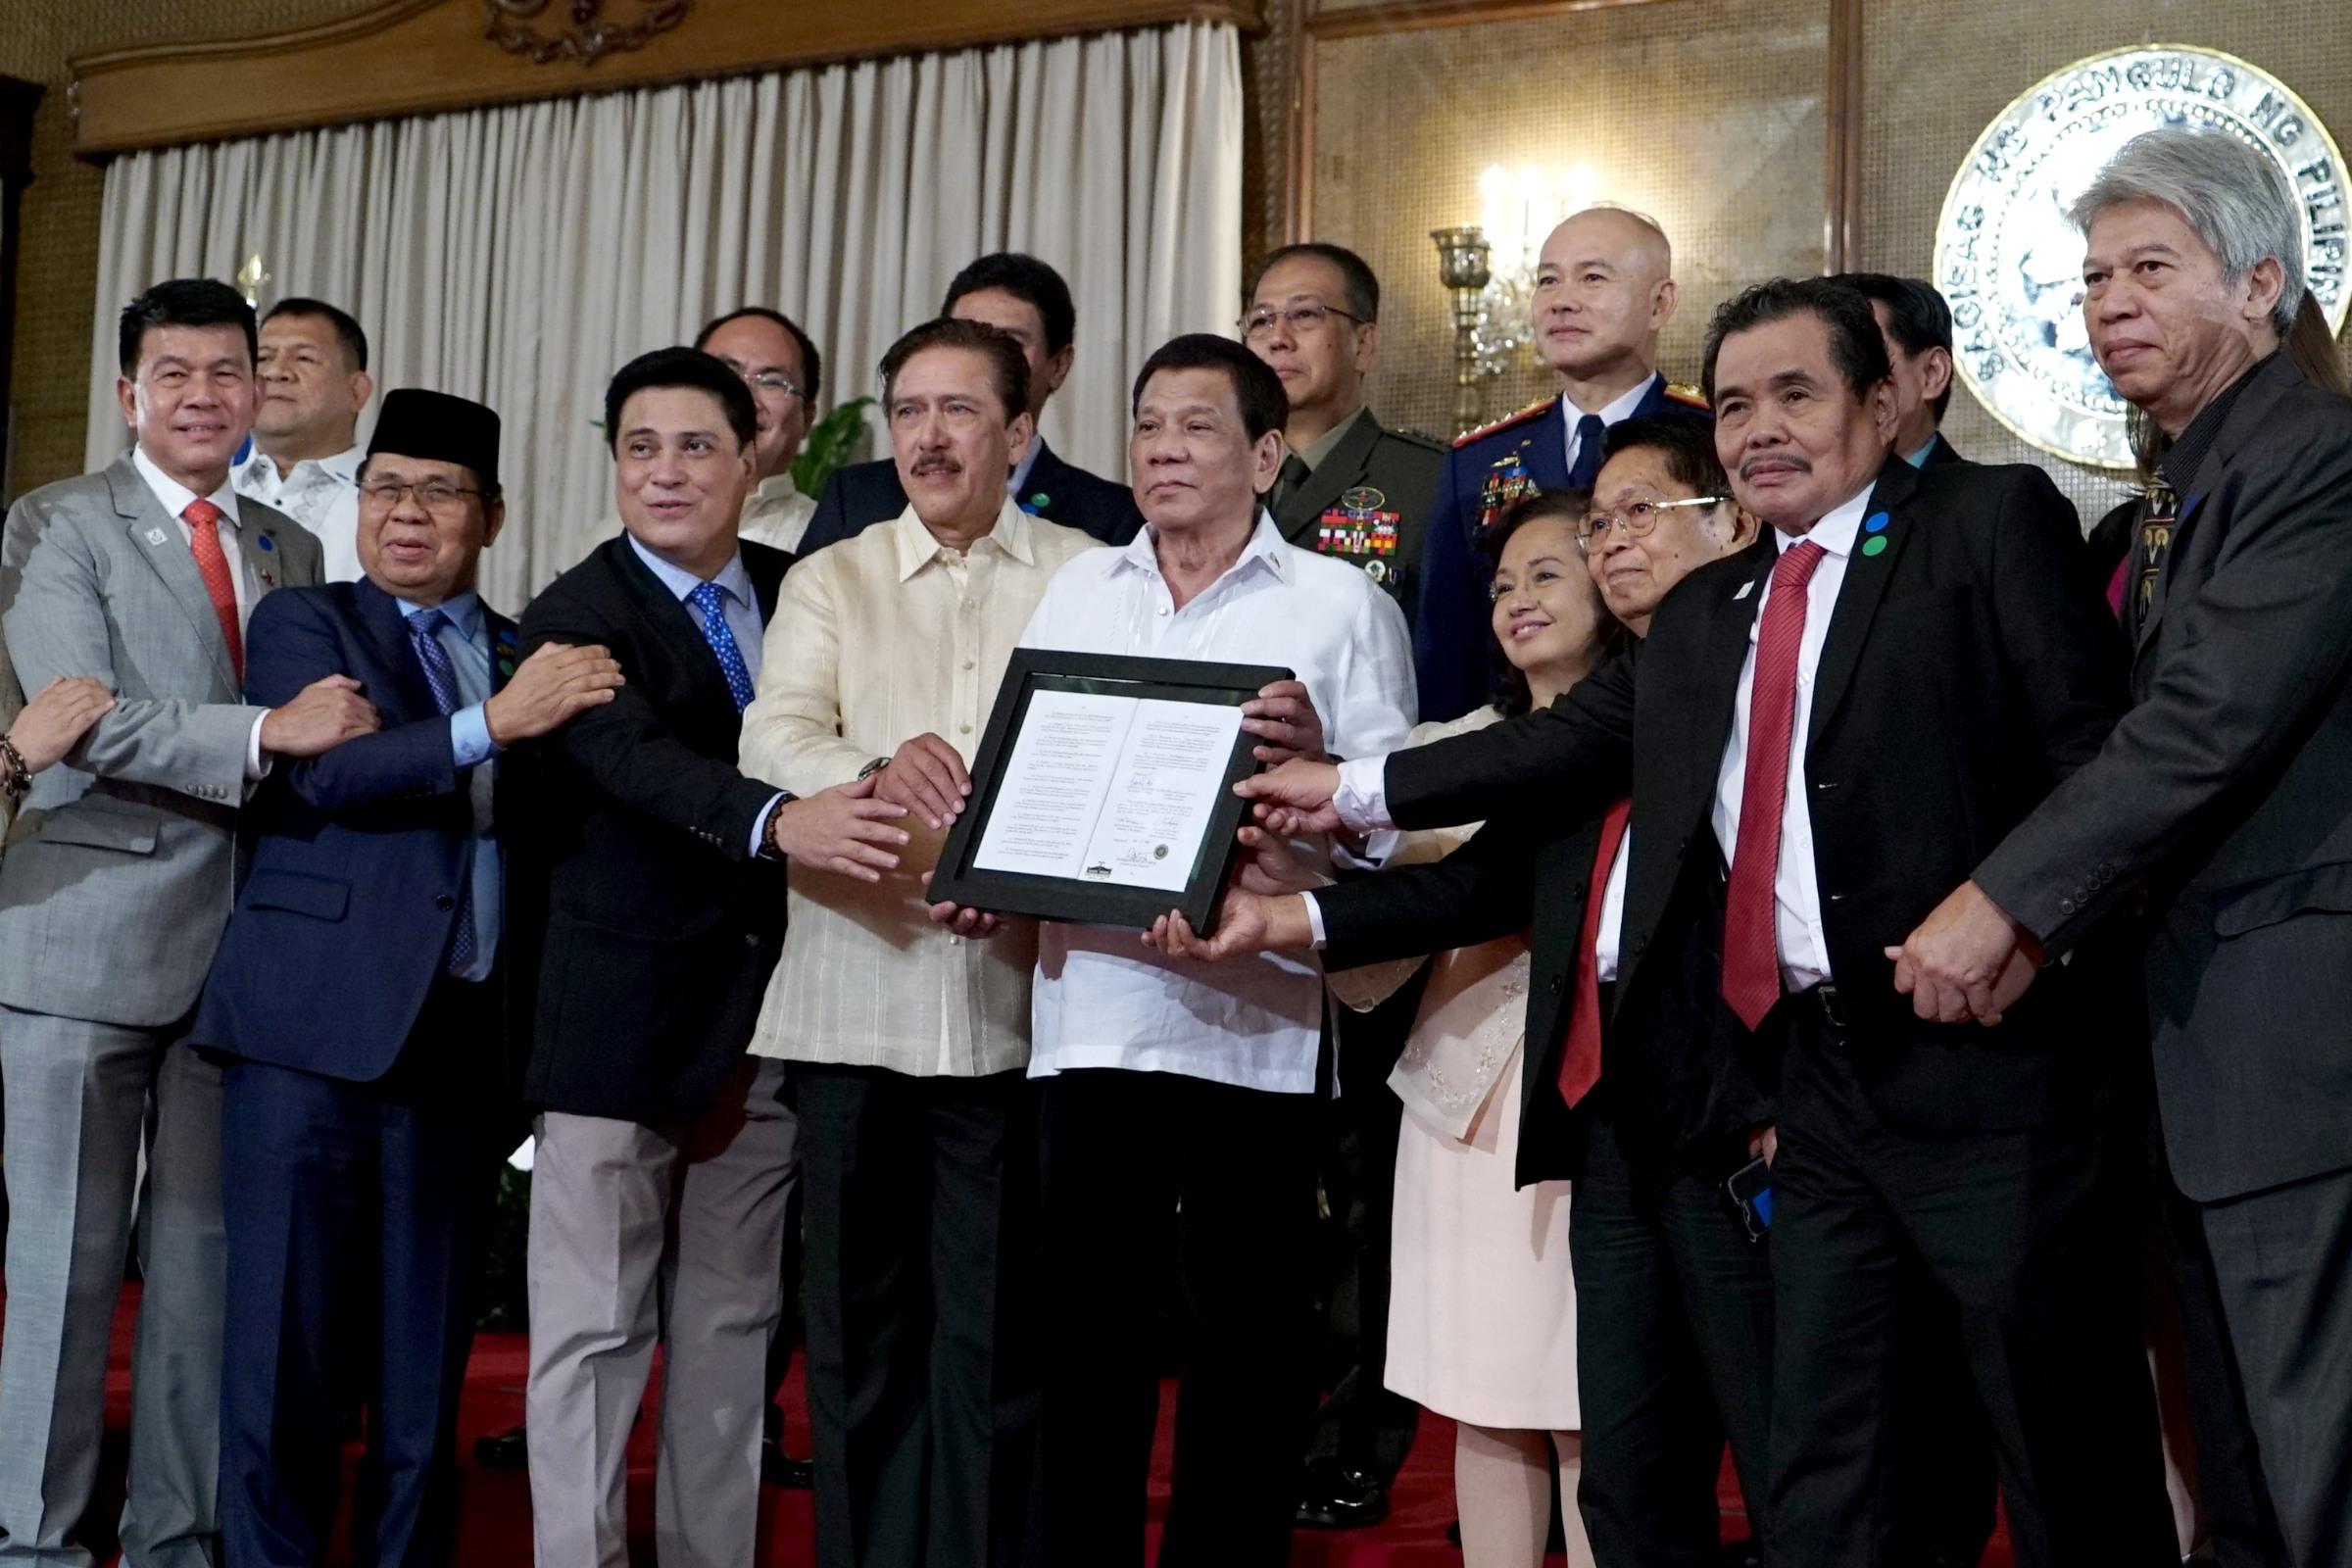 GPH, MILF panel chairs to present Bangsamoro Organic Law to Moro people, Mindanao stakeholders